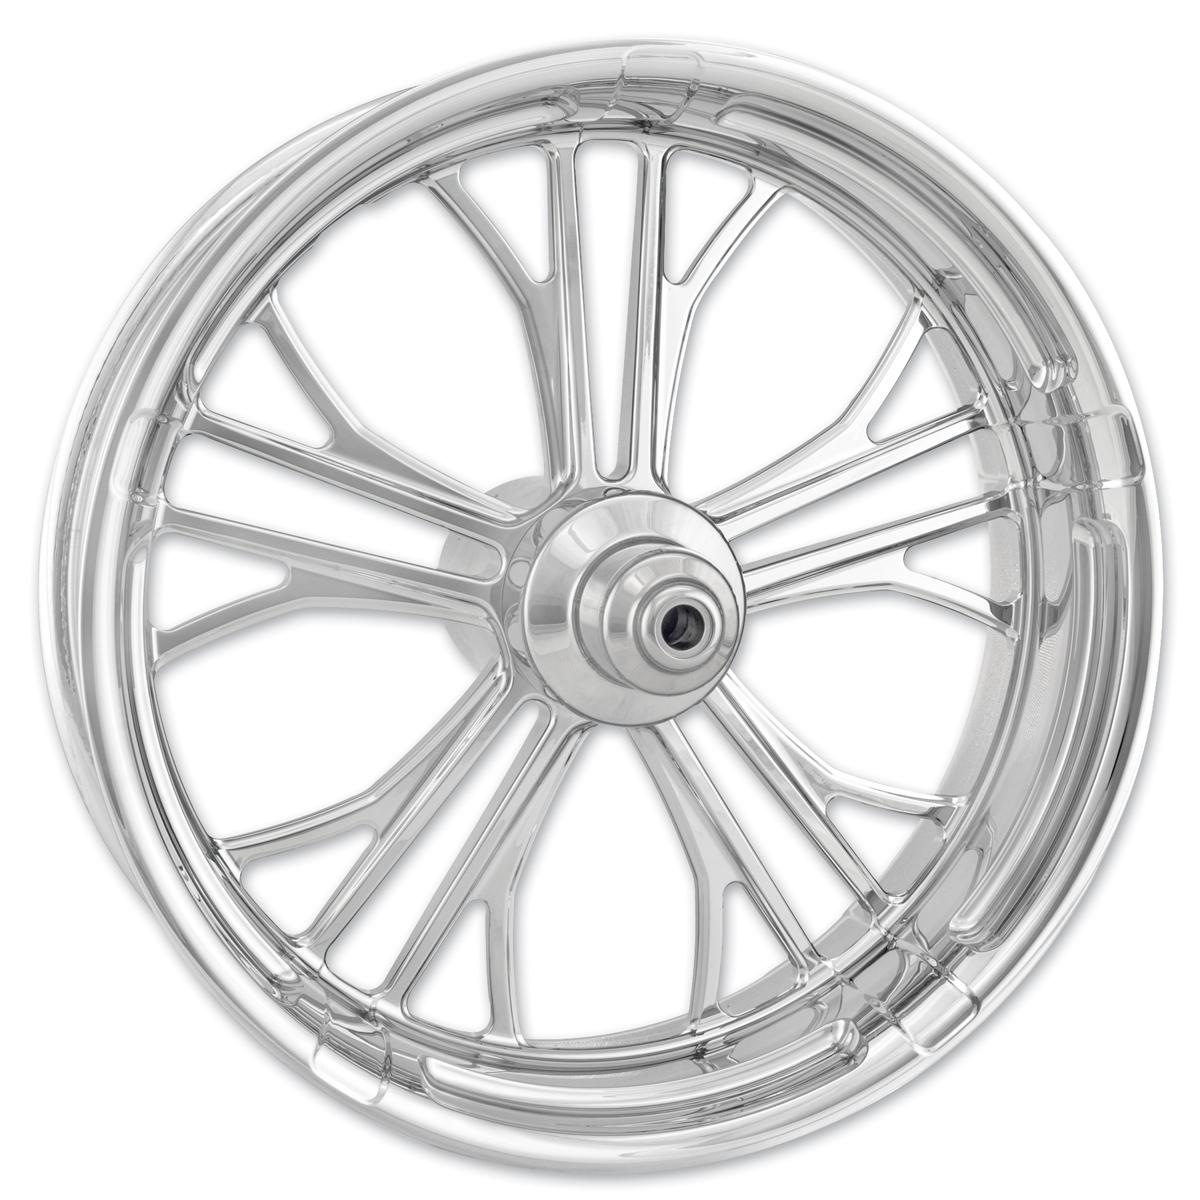 Performance Machine Dixon Chrome Front Wheel 21x3.5